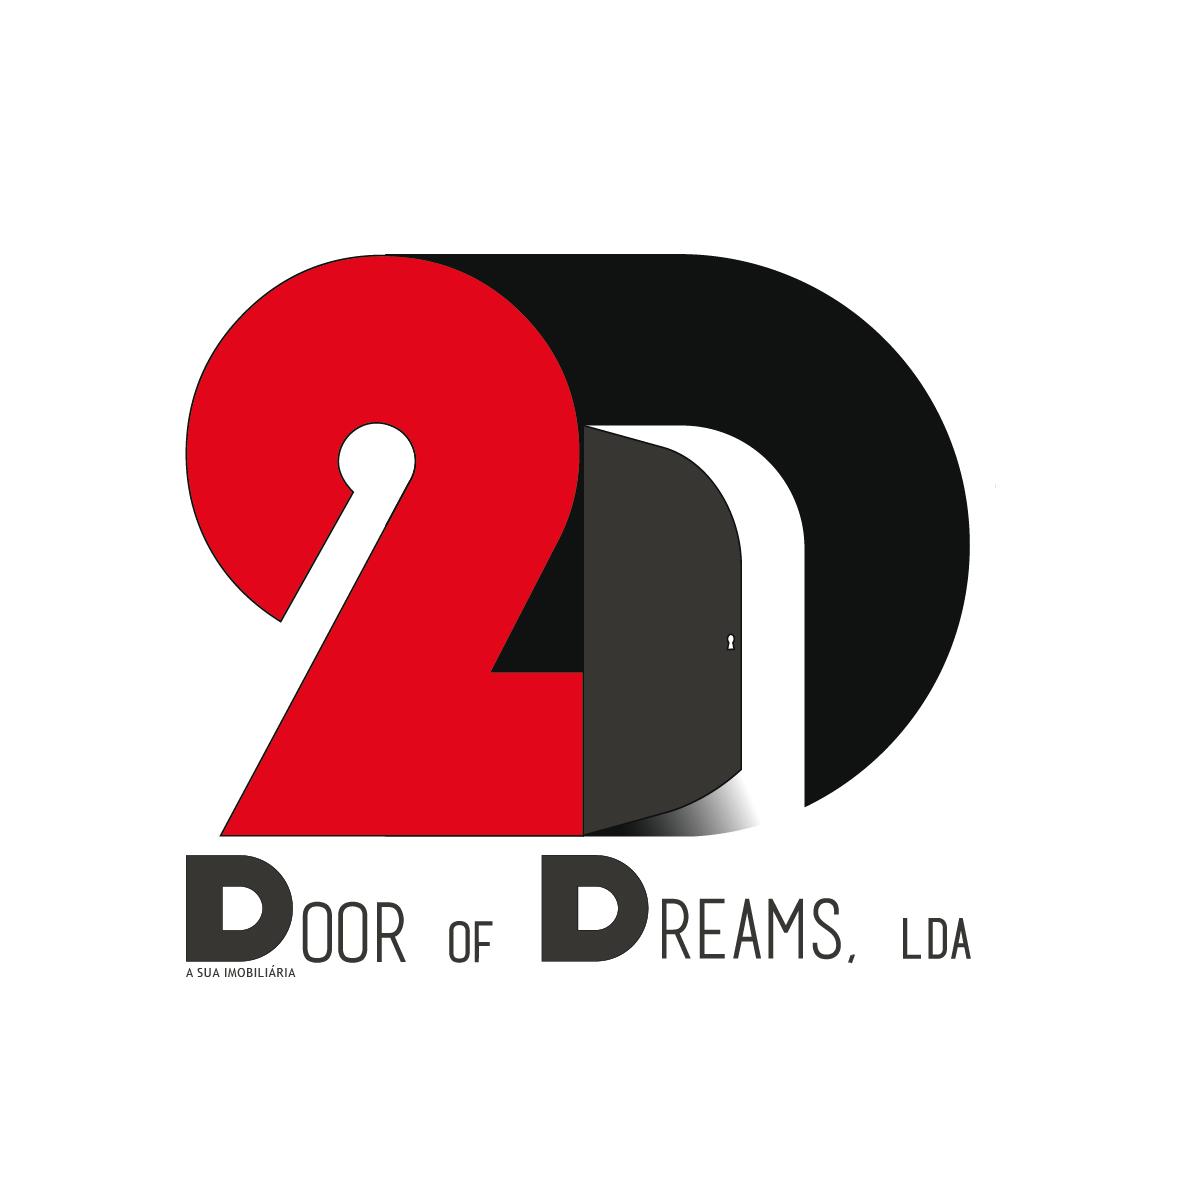 DOOR OF DREAMS, LDA